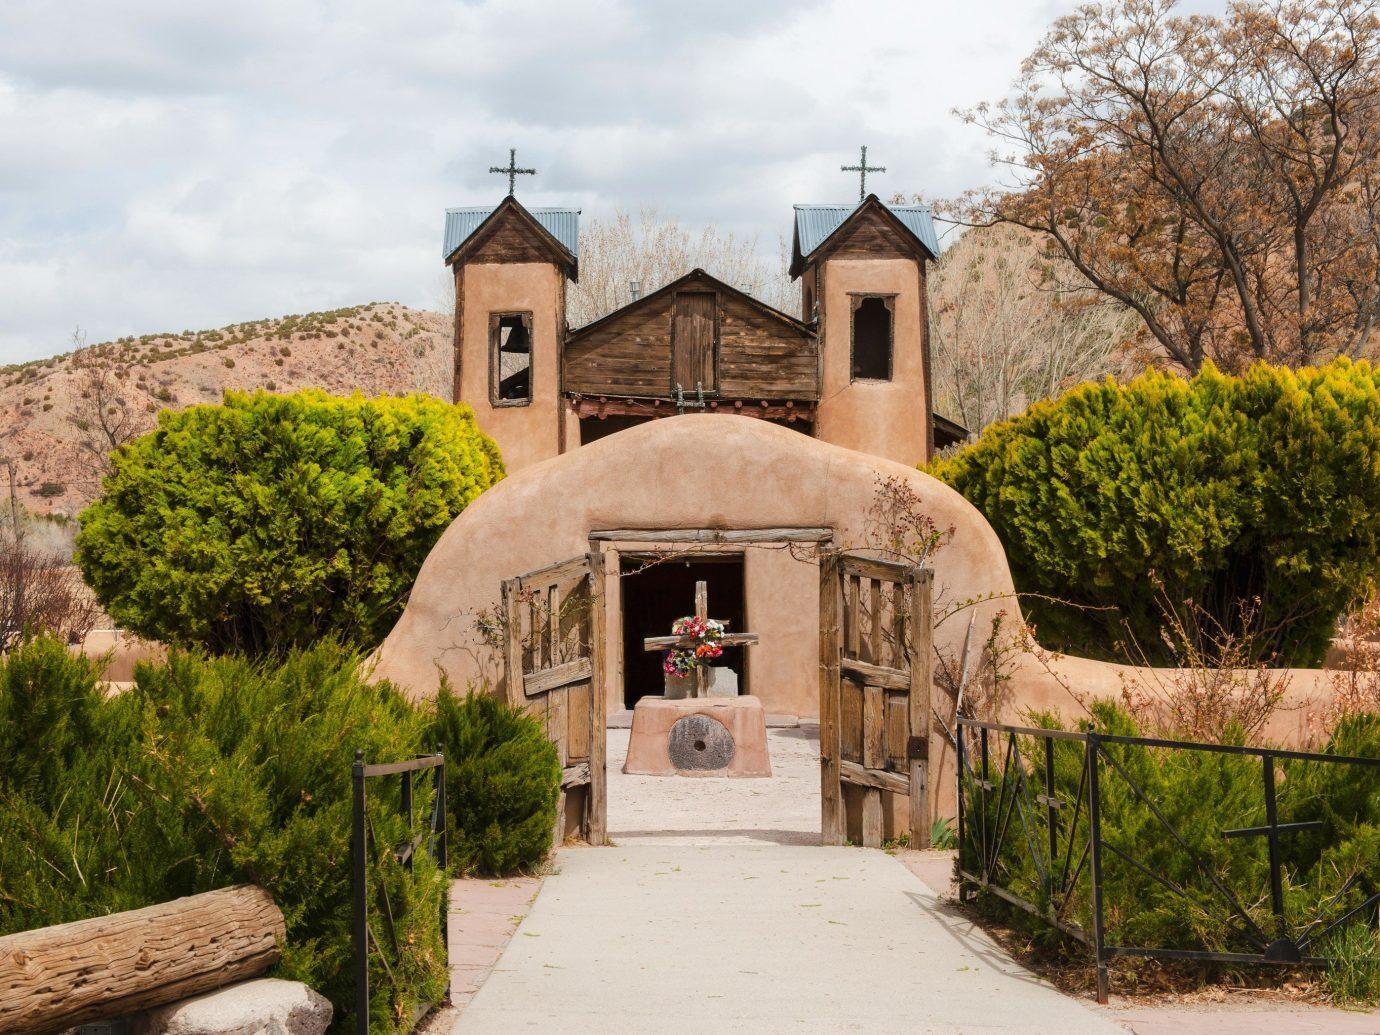 historic site estate chapel medieval architecture building tree cottage hacienda spanish missions in california place of worship Village tourism Villa